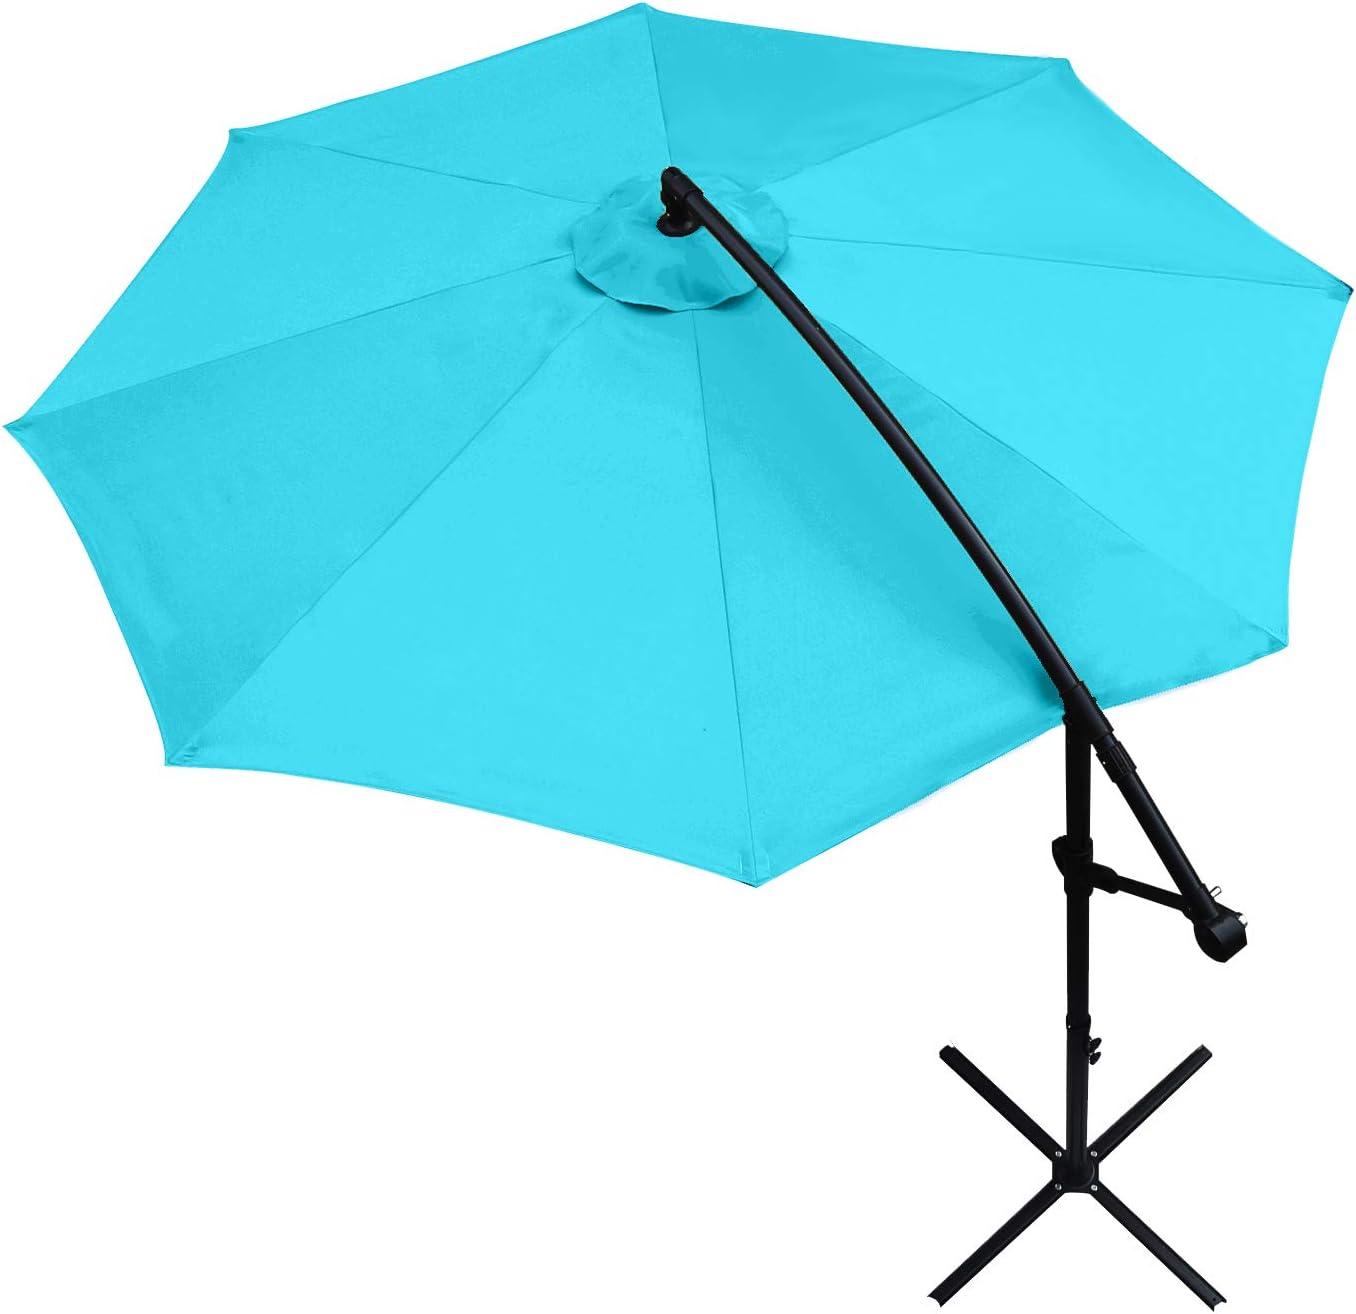 ABCCANOPY Patio Umbrellas 10 FT Outdoor Market Umbrella Cantilever Umbrella Offset Hanging Umbrellas with Crank & Cross Base, 13+ Colors,(Turquoise)